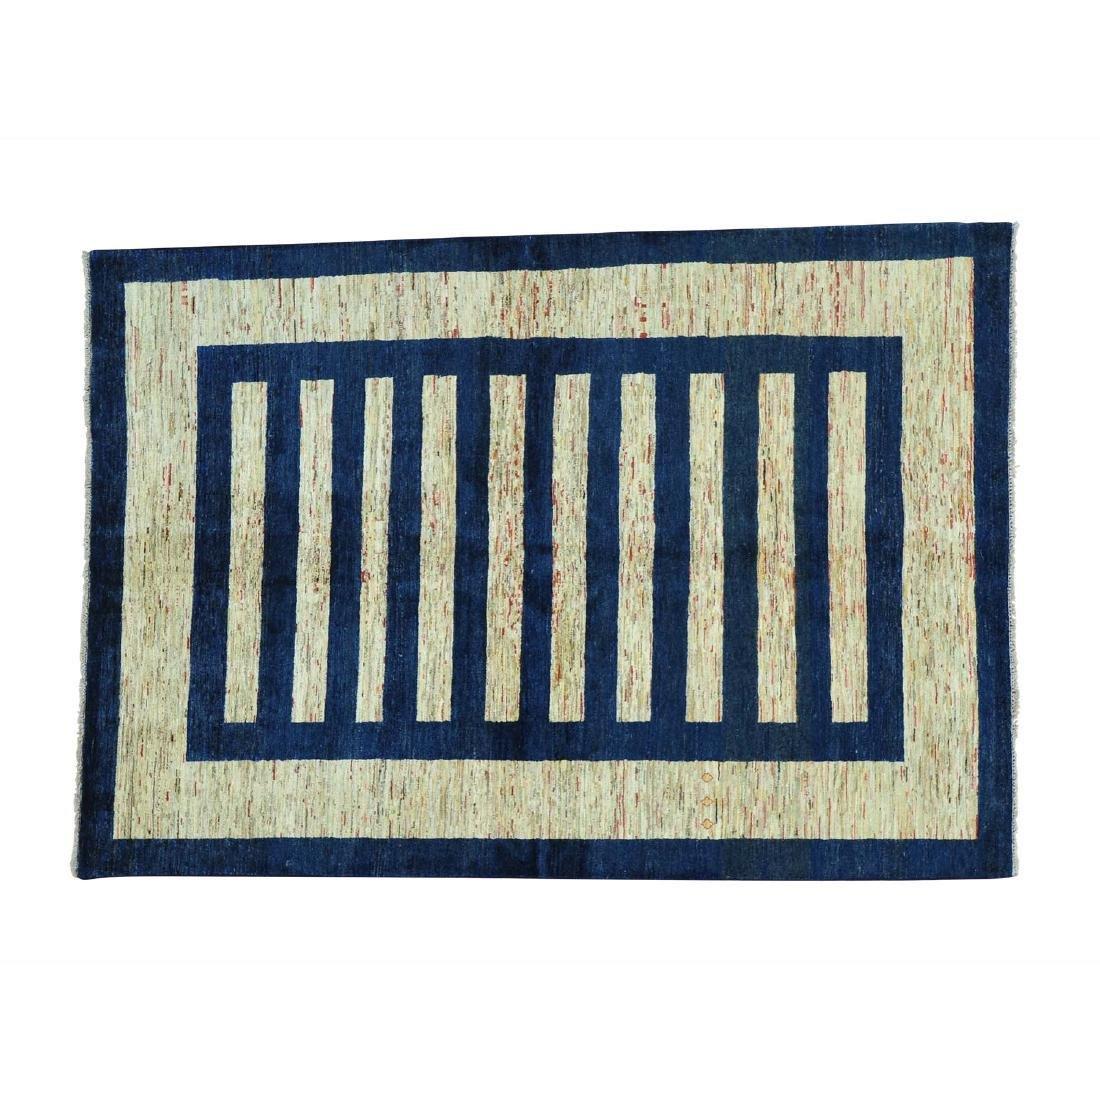 100 Percent Wool Peshawar Gabbeh Hand Knotted Rug 5.7x8